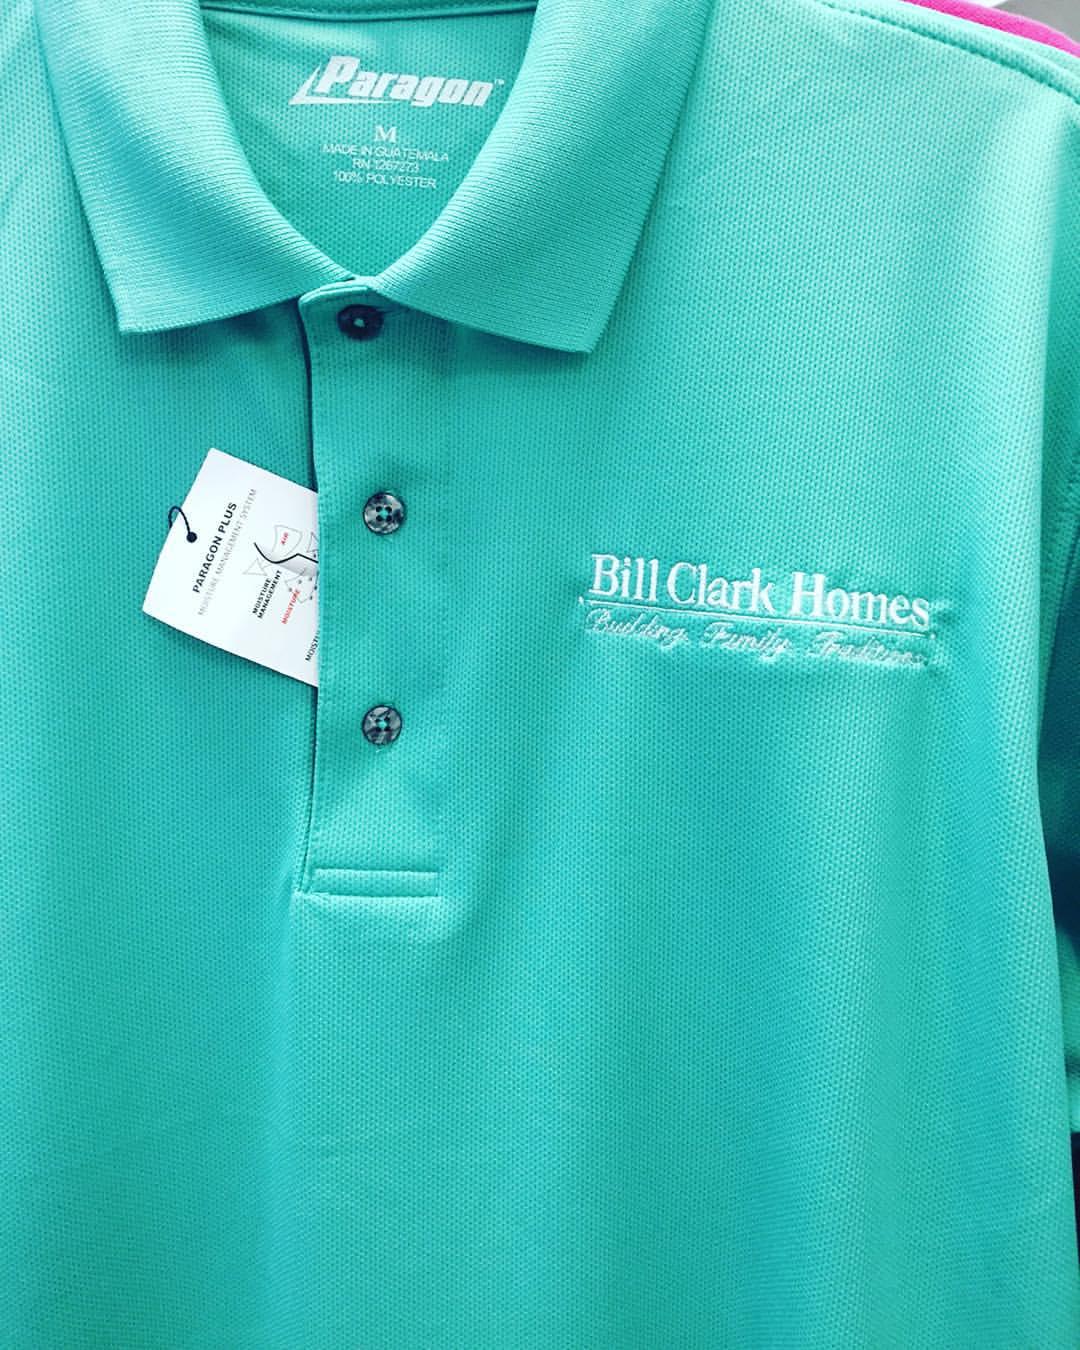 Custom t shirts for wilmington nc custom embroidery for Custom t shirts and embroidery